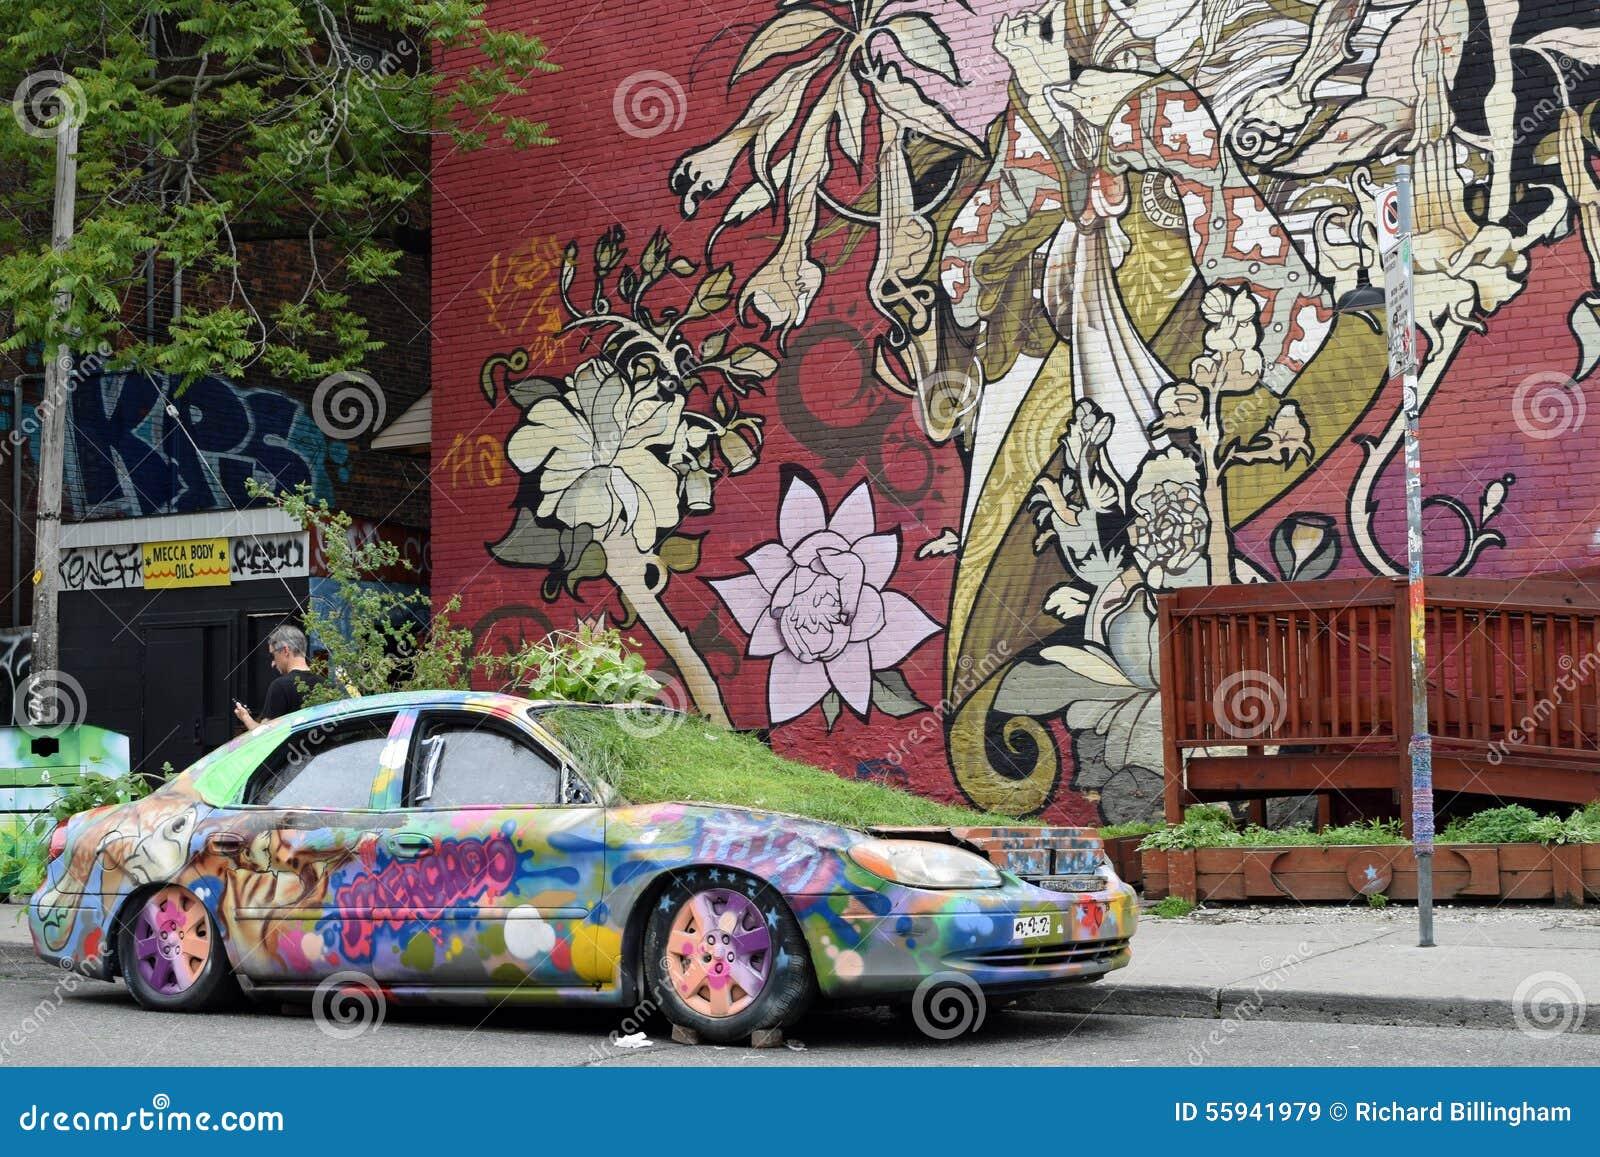 artistic car mural kensington market toronto canada editorial artistic canada car kensington market mural painted toronto wall